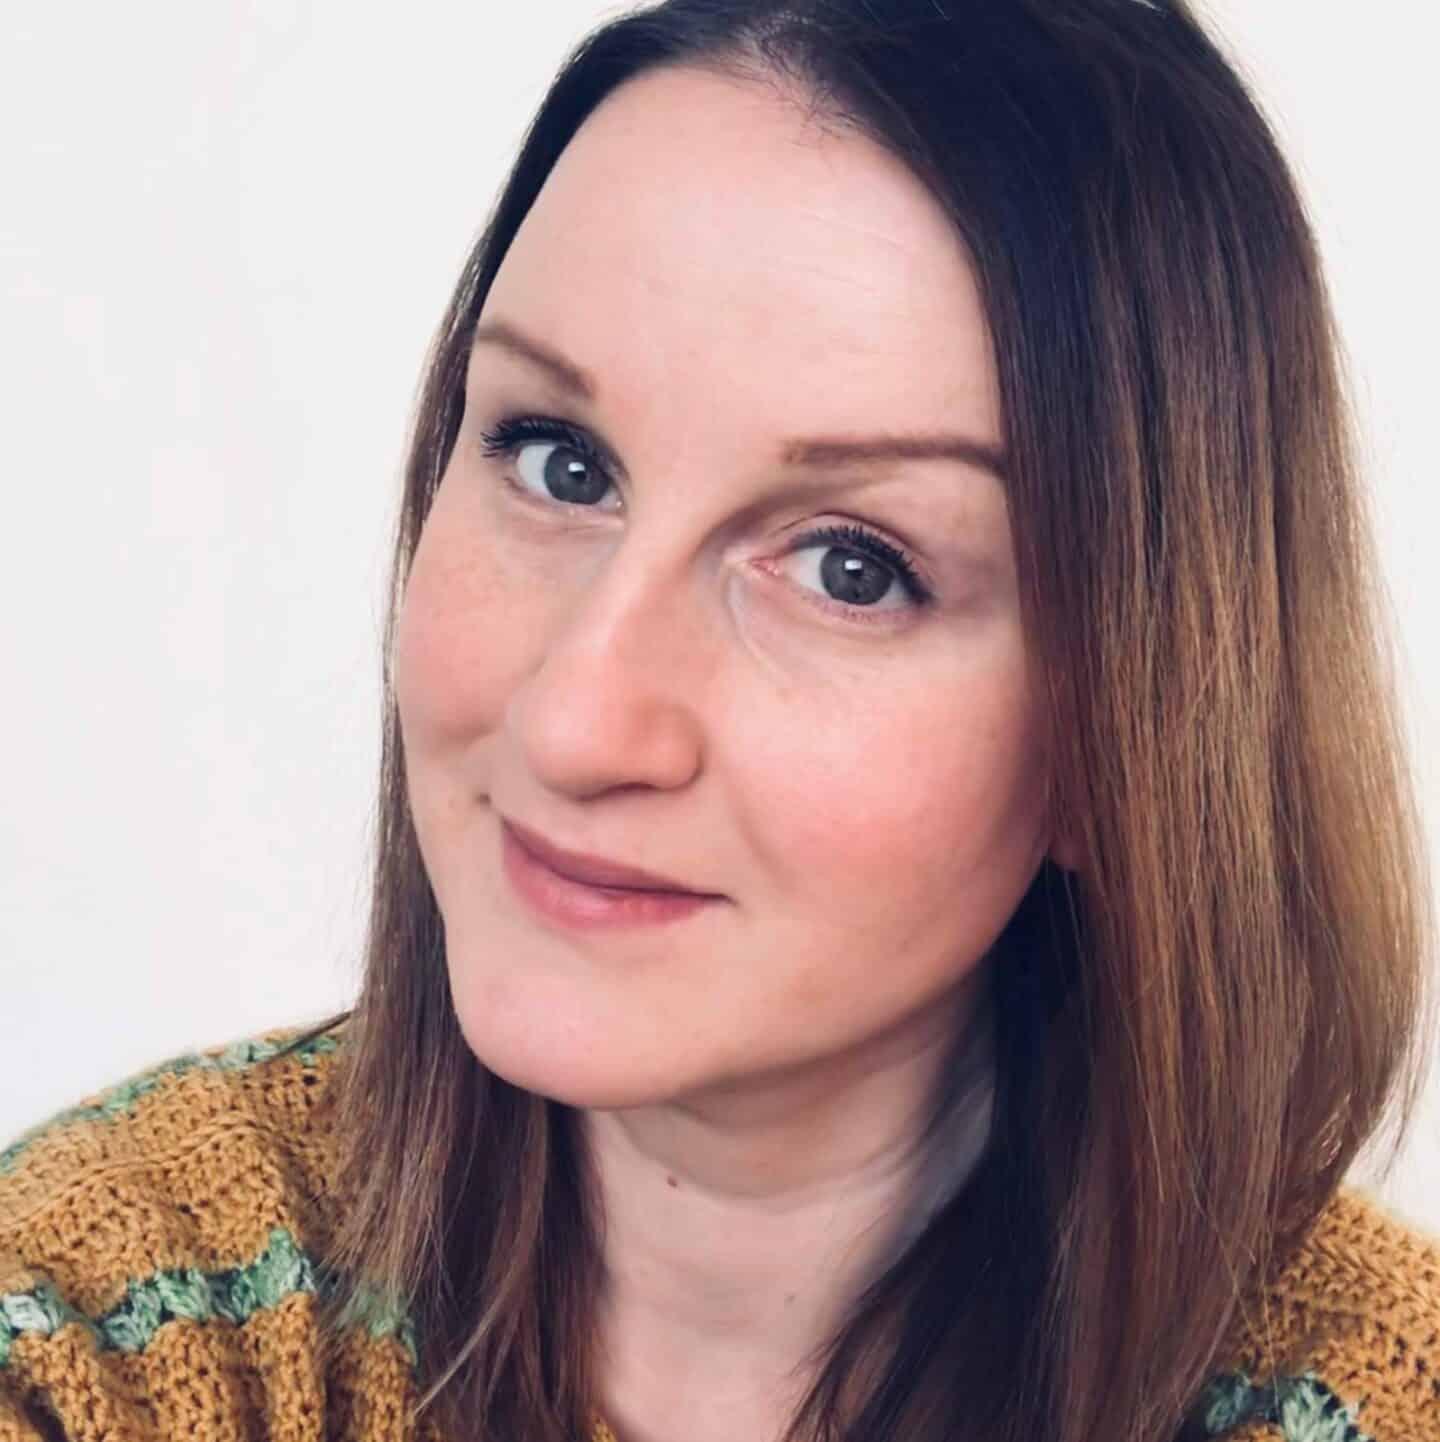 Headshot of Veronika Cromwell Blue Star Crochet designer smiling